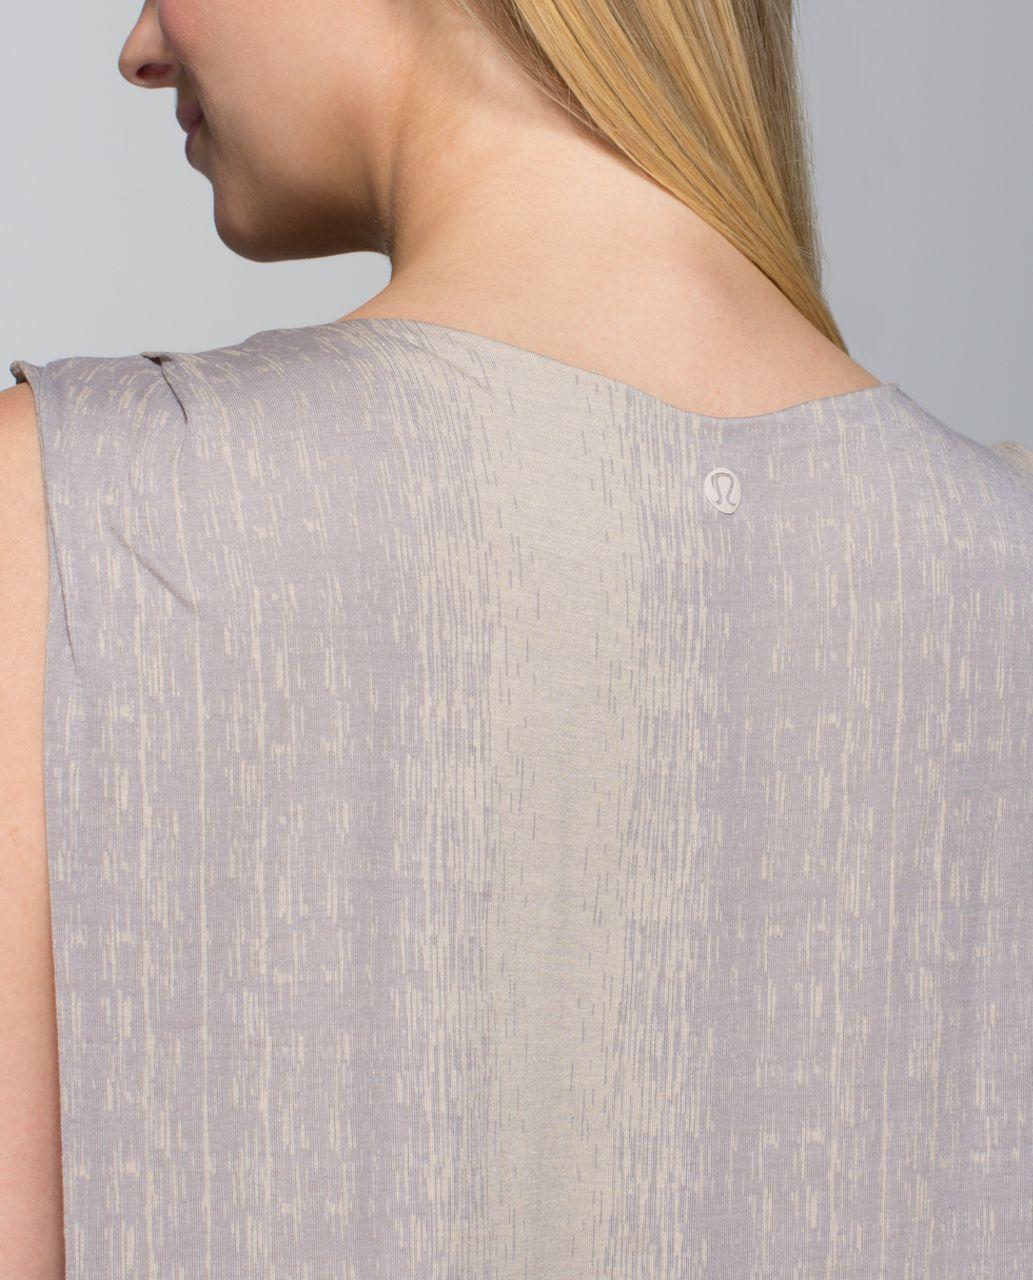 Lululemon Salutation To Savasana Tank - Misty Stripe Burnout Cashew Ambient Grey